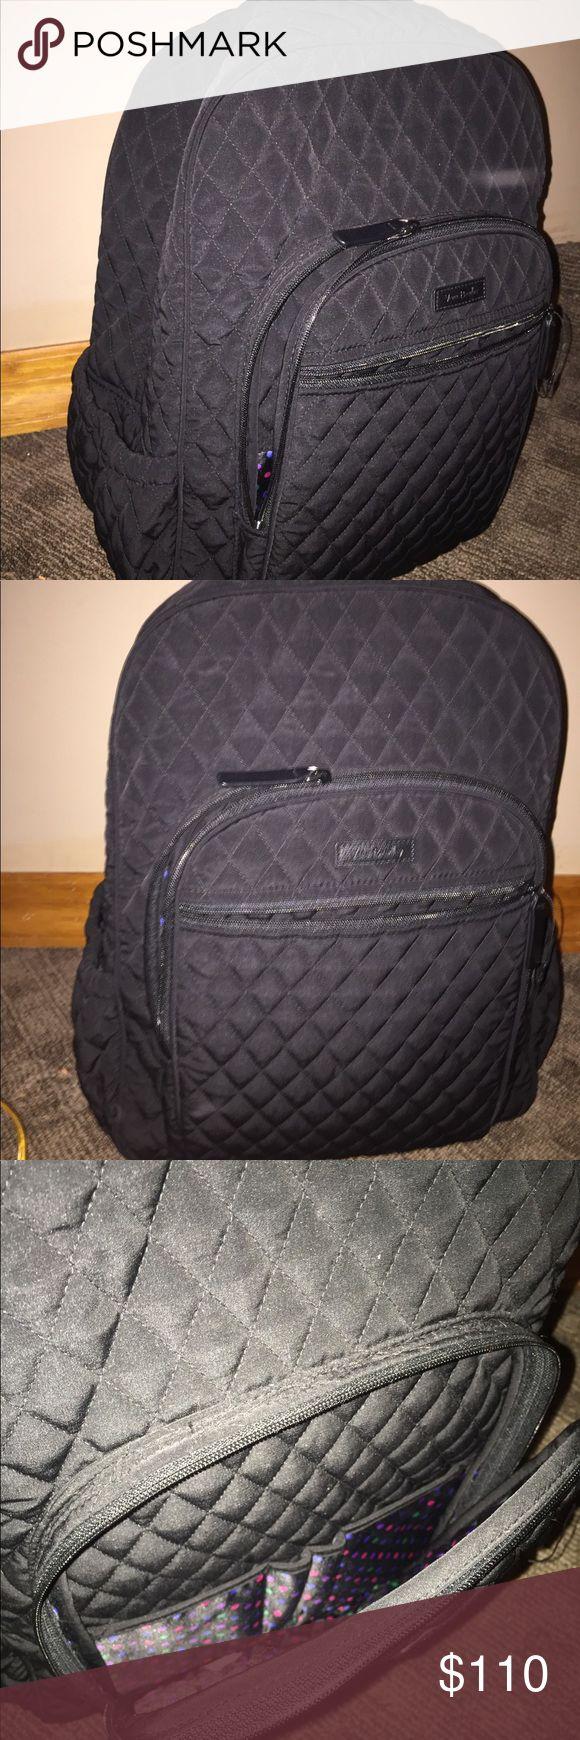 Vera Bradley Bookbag Brand New Book Bag Spacious Great For College